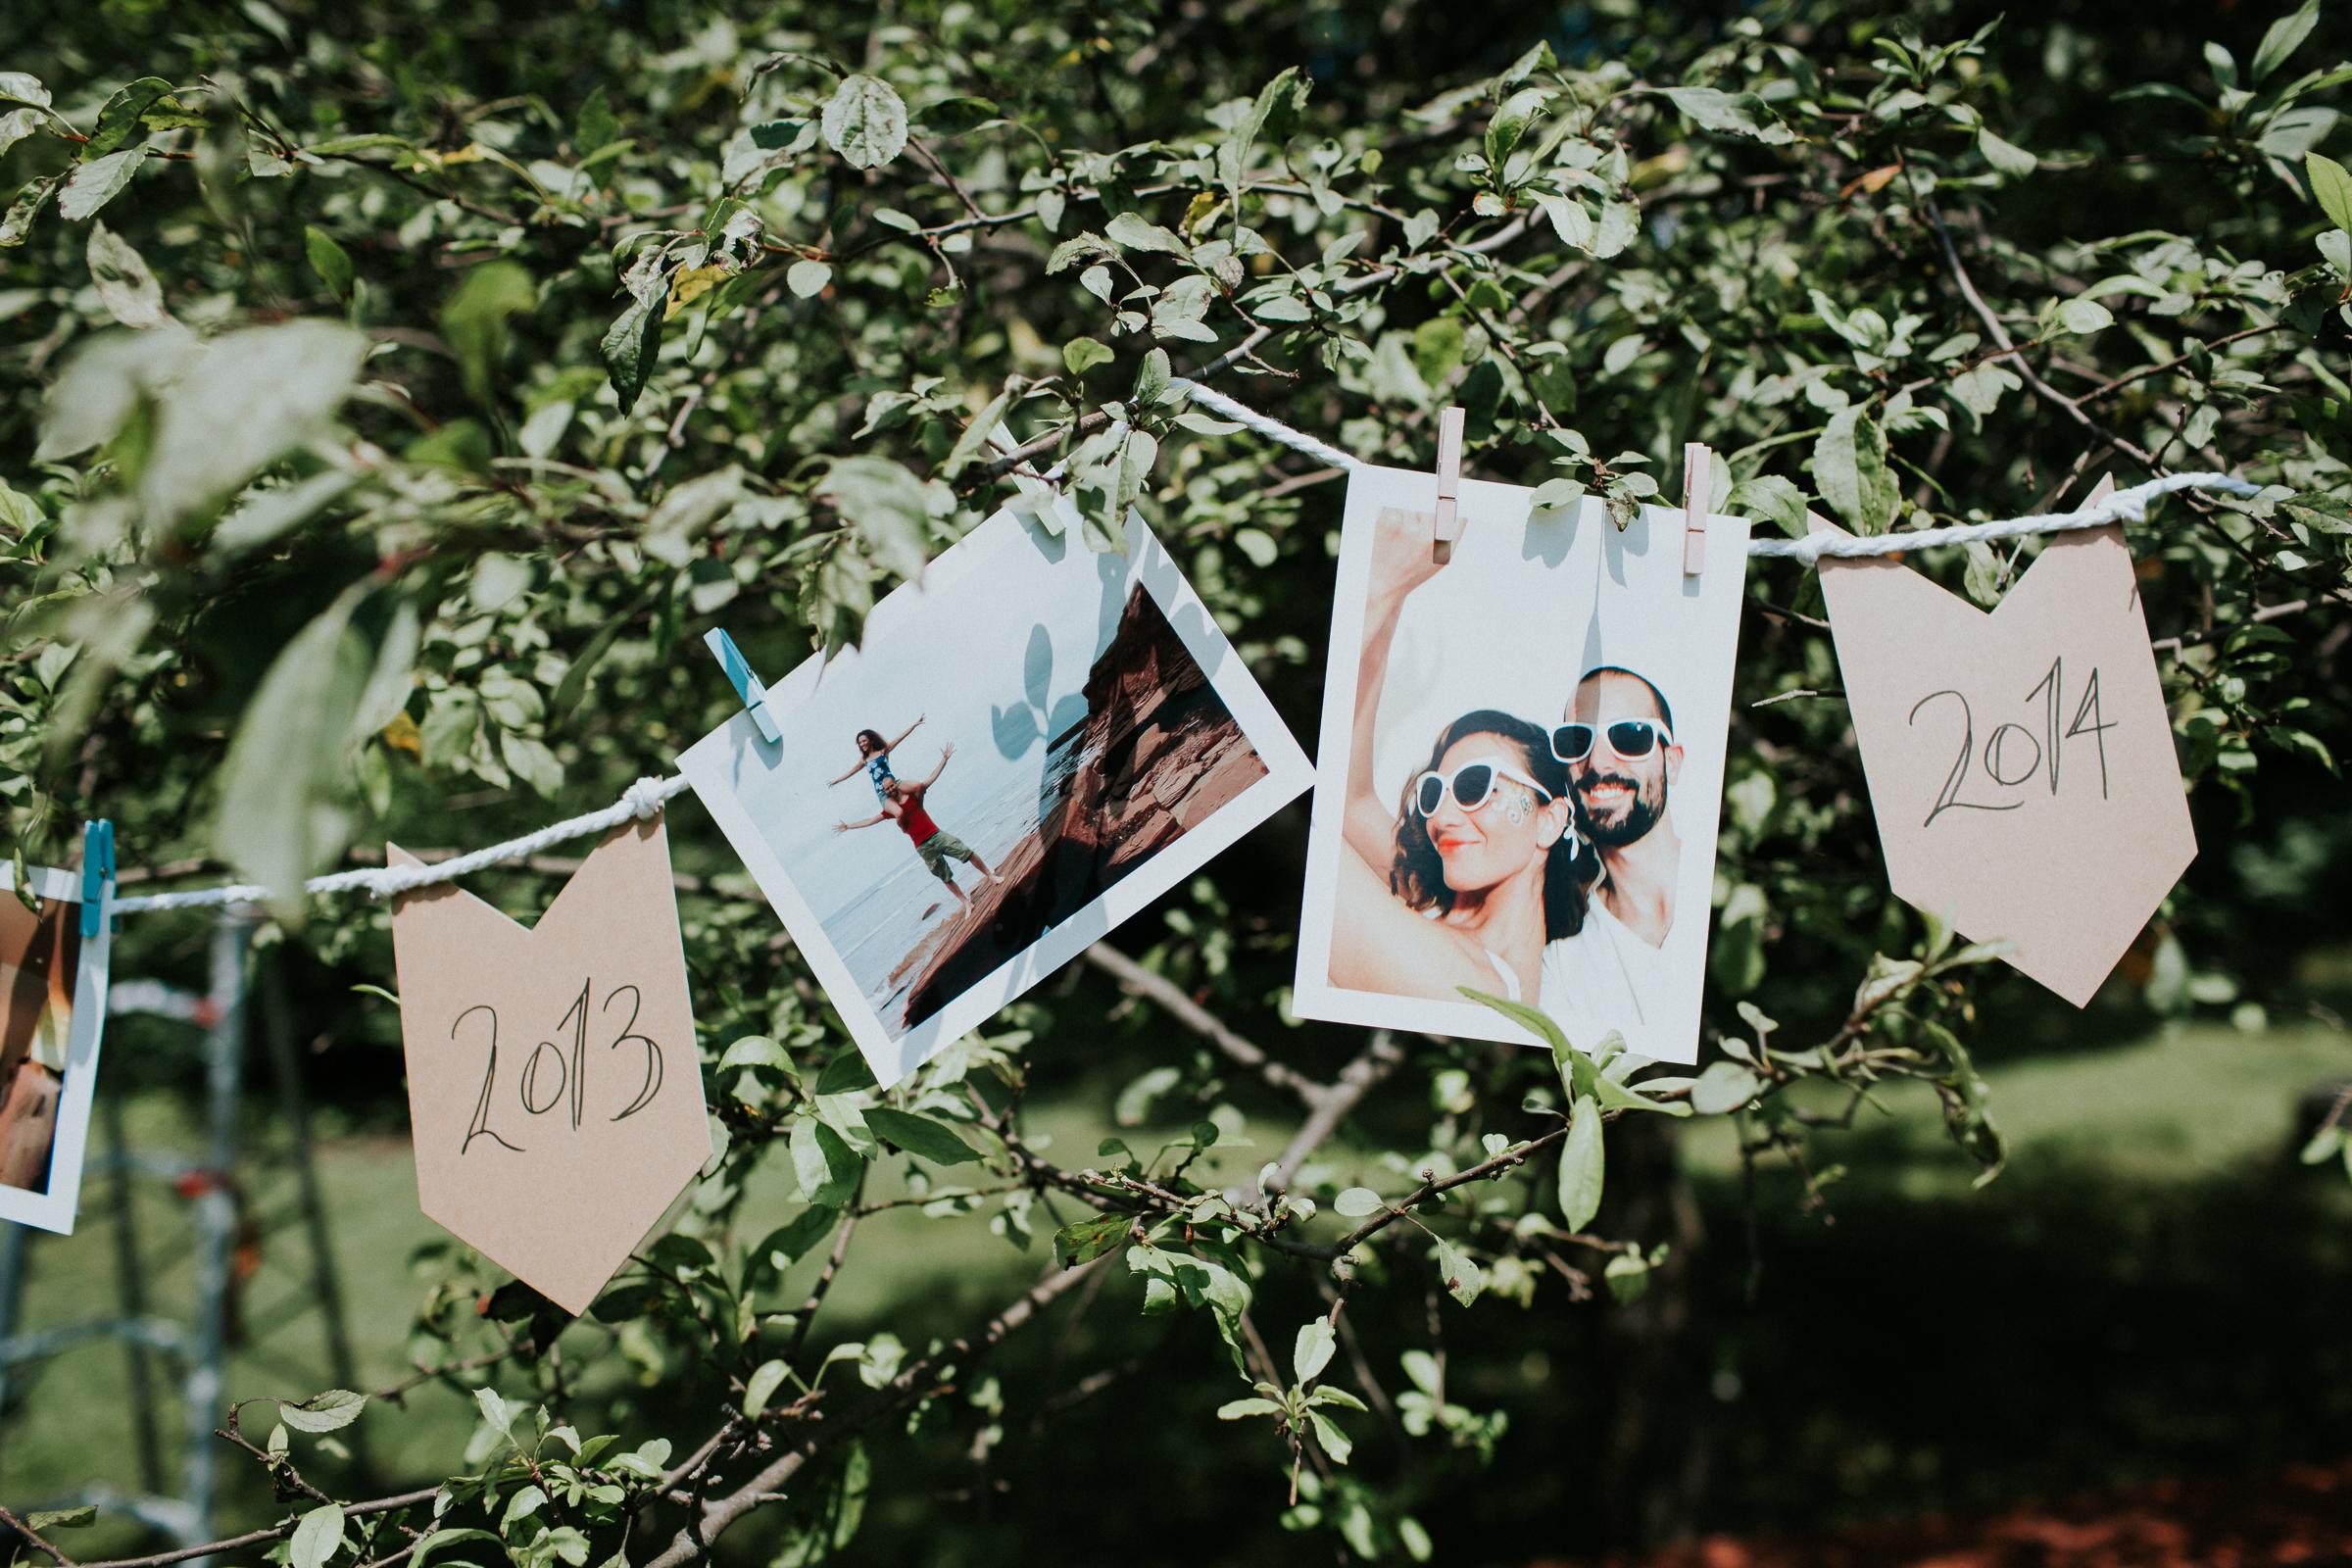 Backyard-Intimate-Adventurous-Destination-Wedding-Darien-Connecticut-Documentary-Wedding-Photography-35.jpg